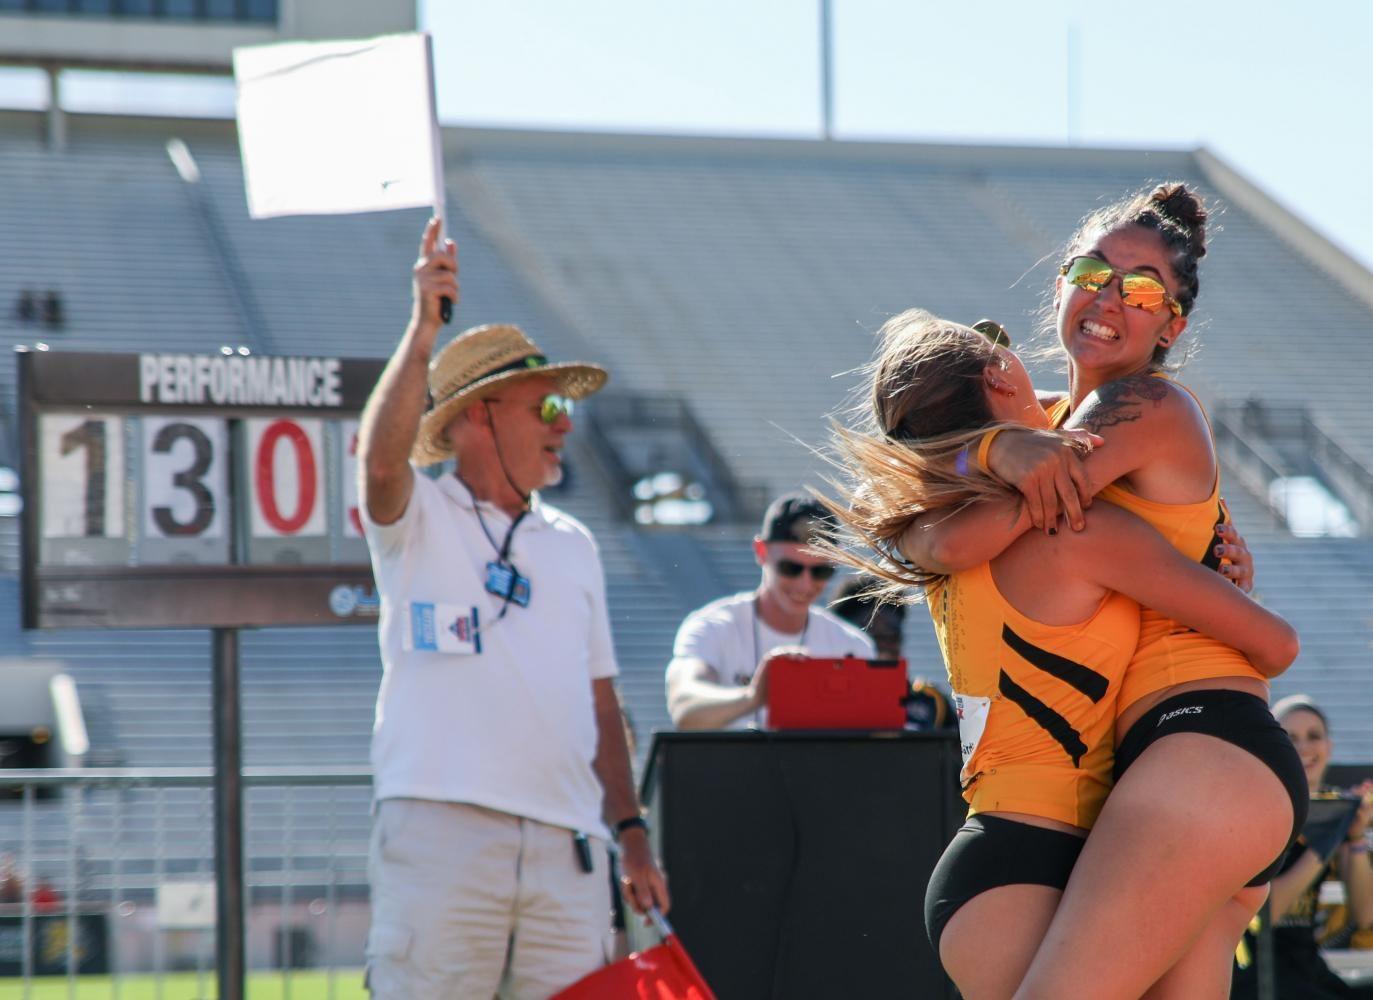 PHOTOS: Shockers track sweep final MVC Championship